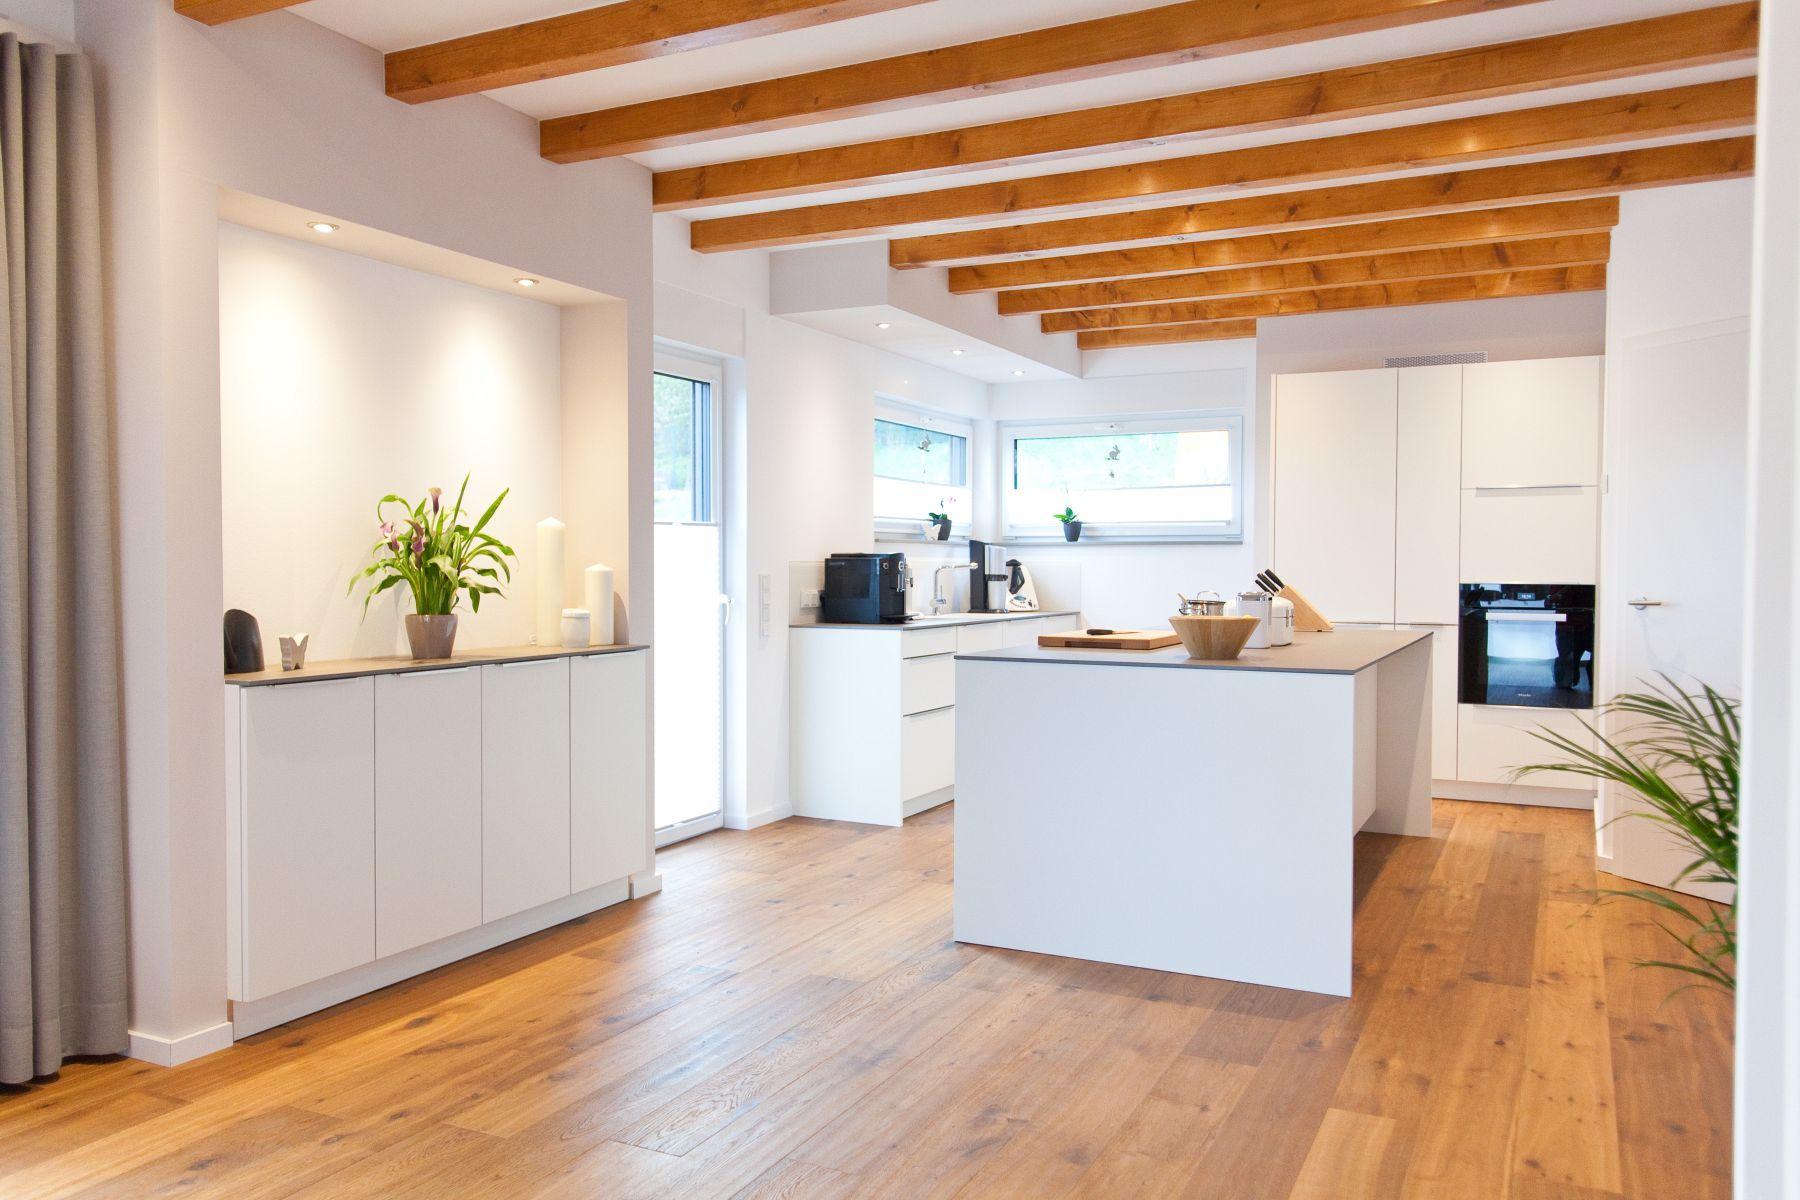 kueche weiss modern landhausstil keramik bora kochfeld 011 thumb k che. Black Bedroom Furniture Sets. Home Design Ideas